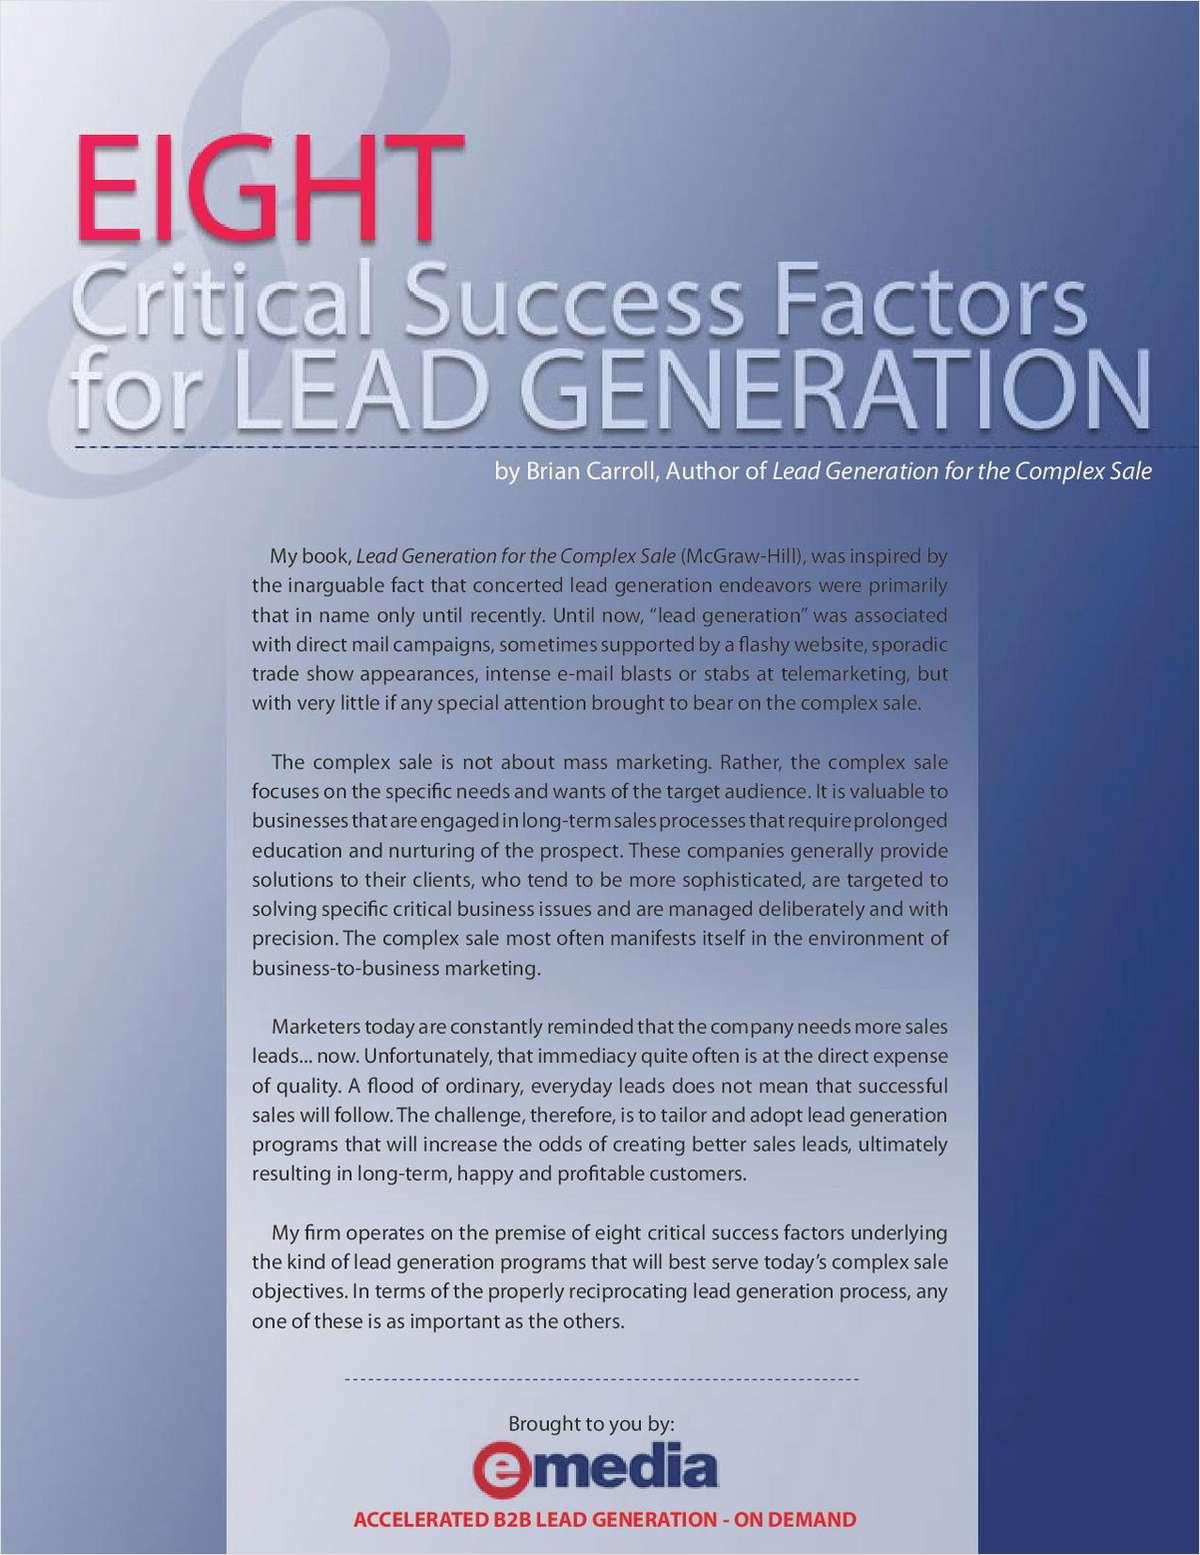 8 Critical Success Factors for Lead Generation